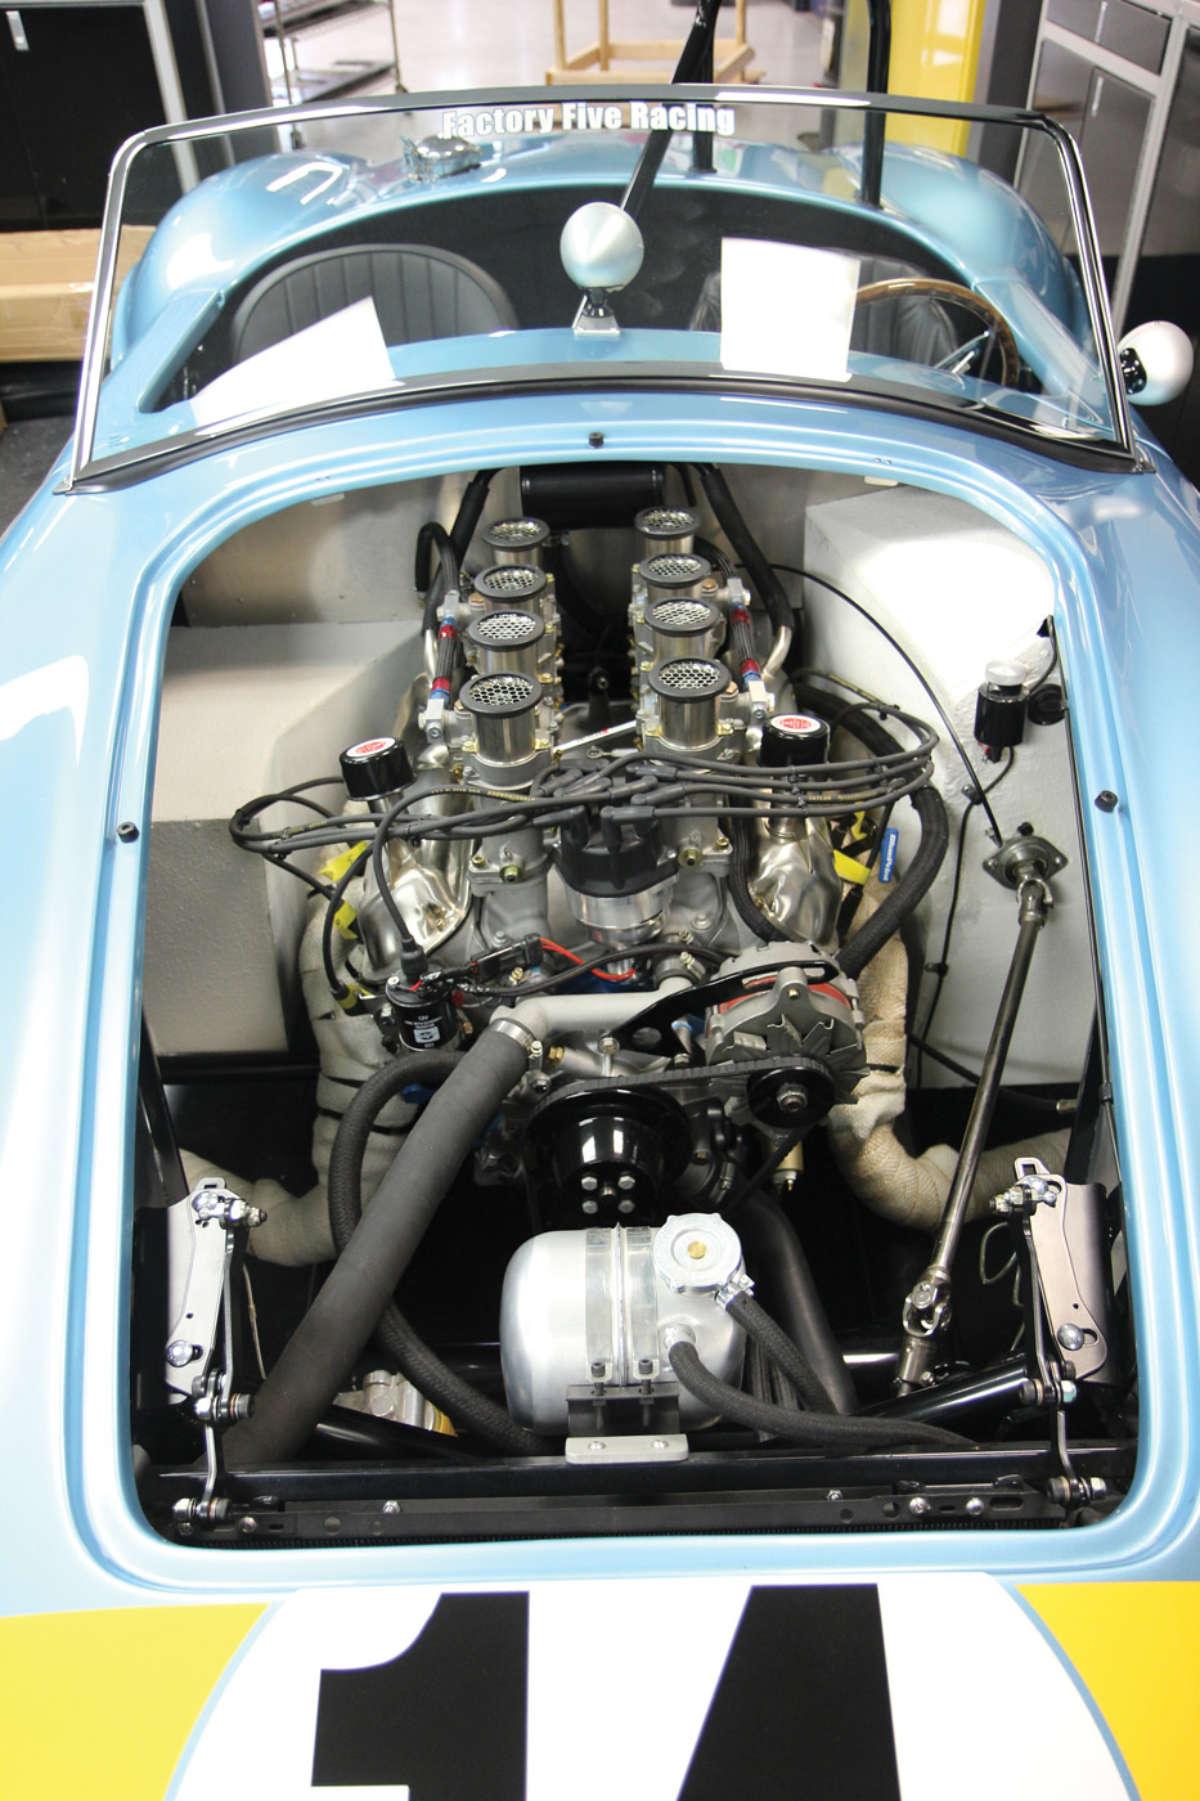 BluePrint Engines joins Factory Five Racing